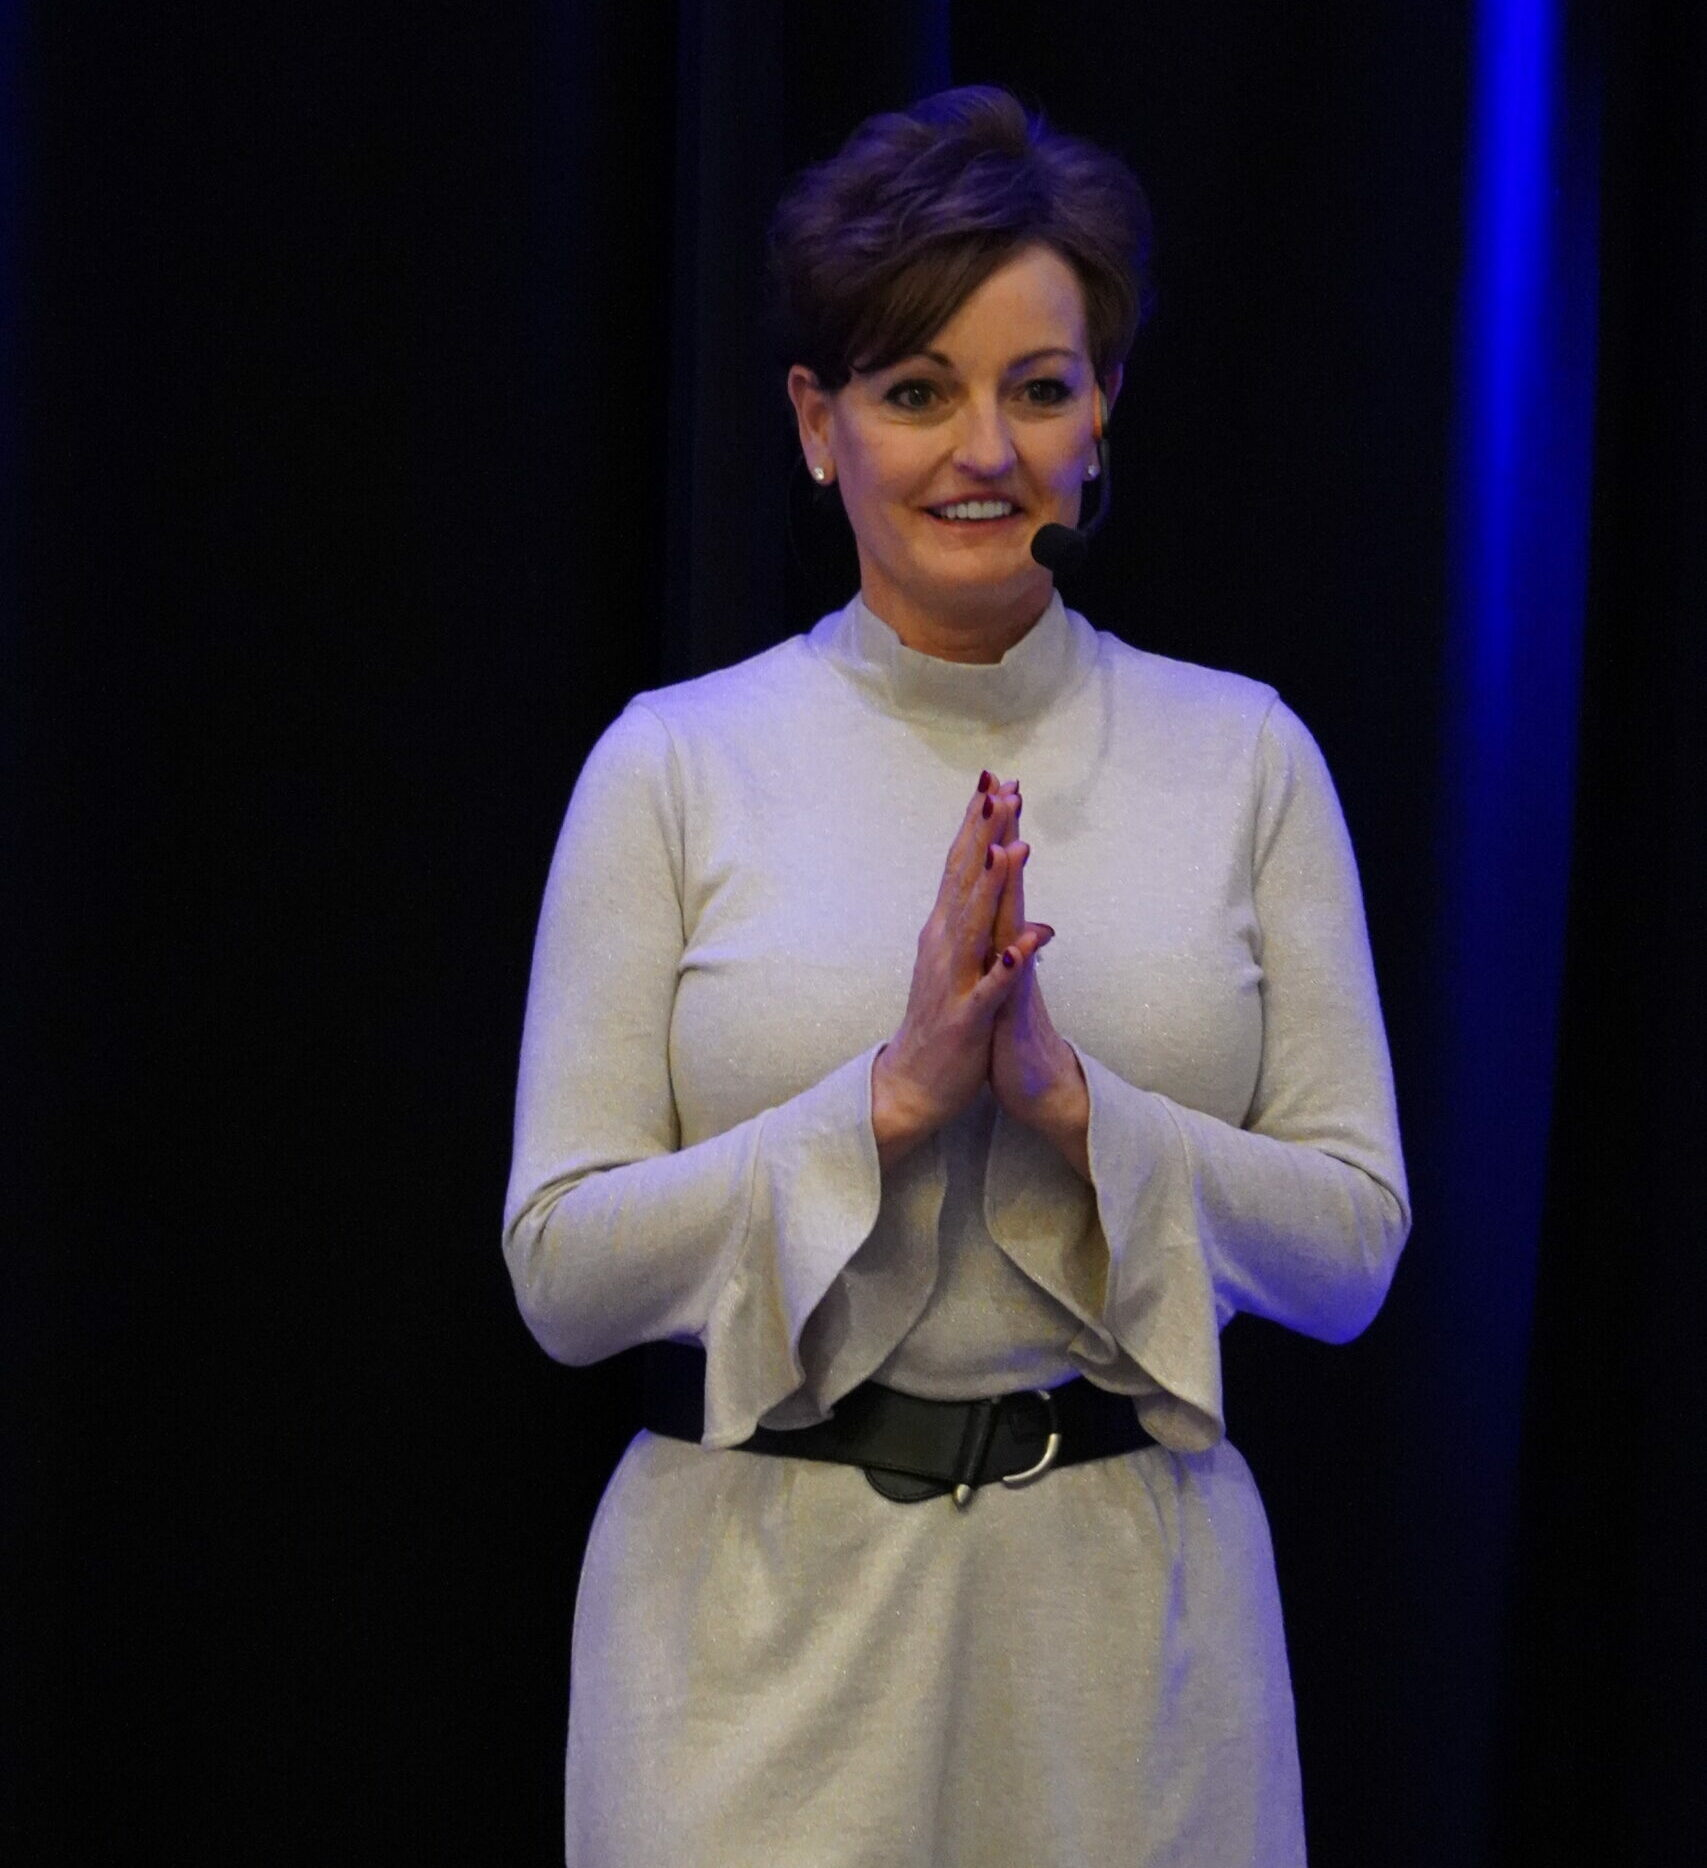 Darla speaking - Thriving during Transition